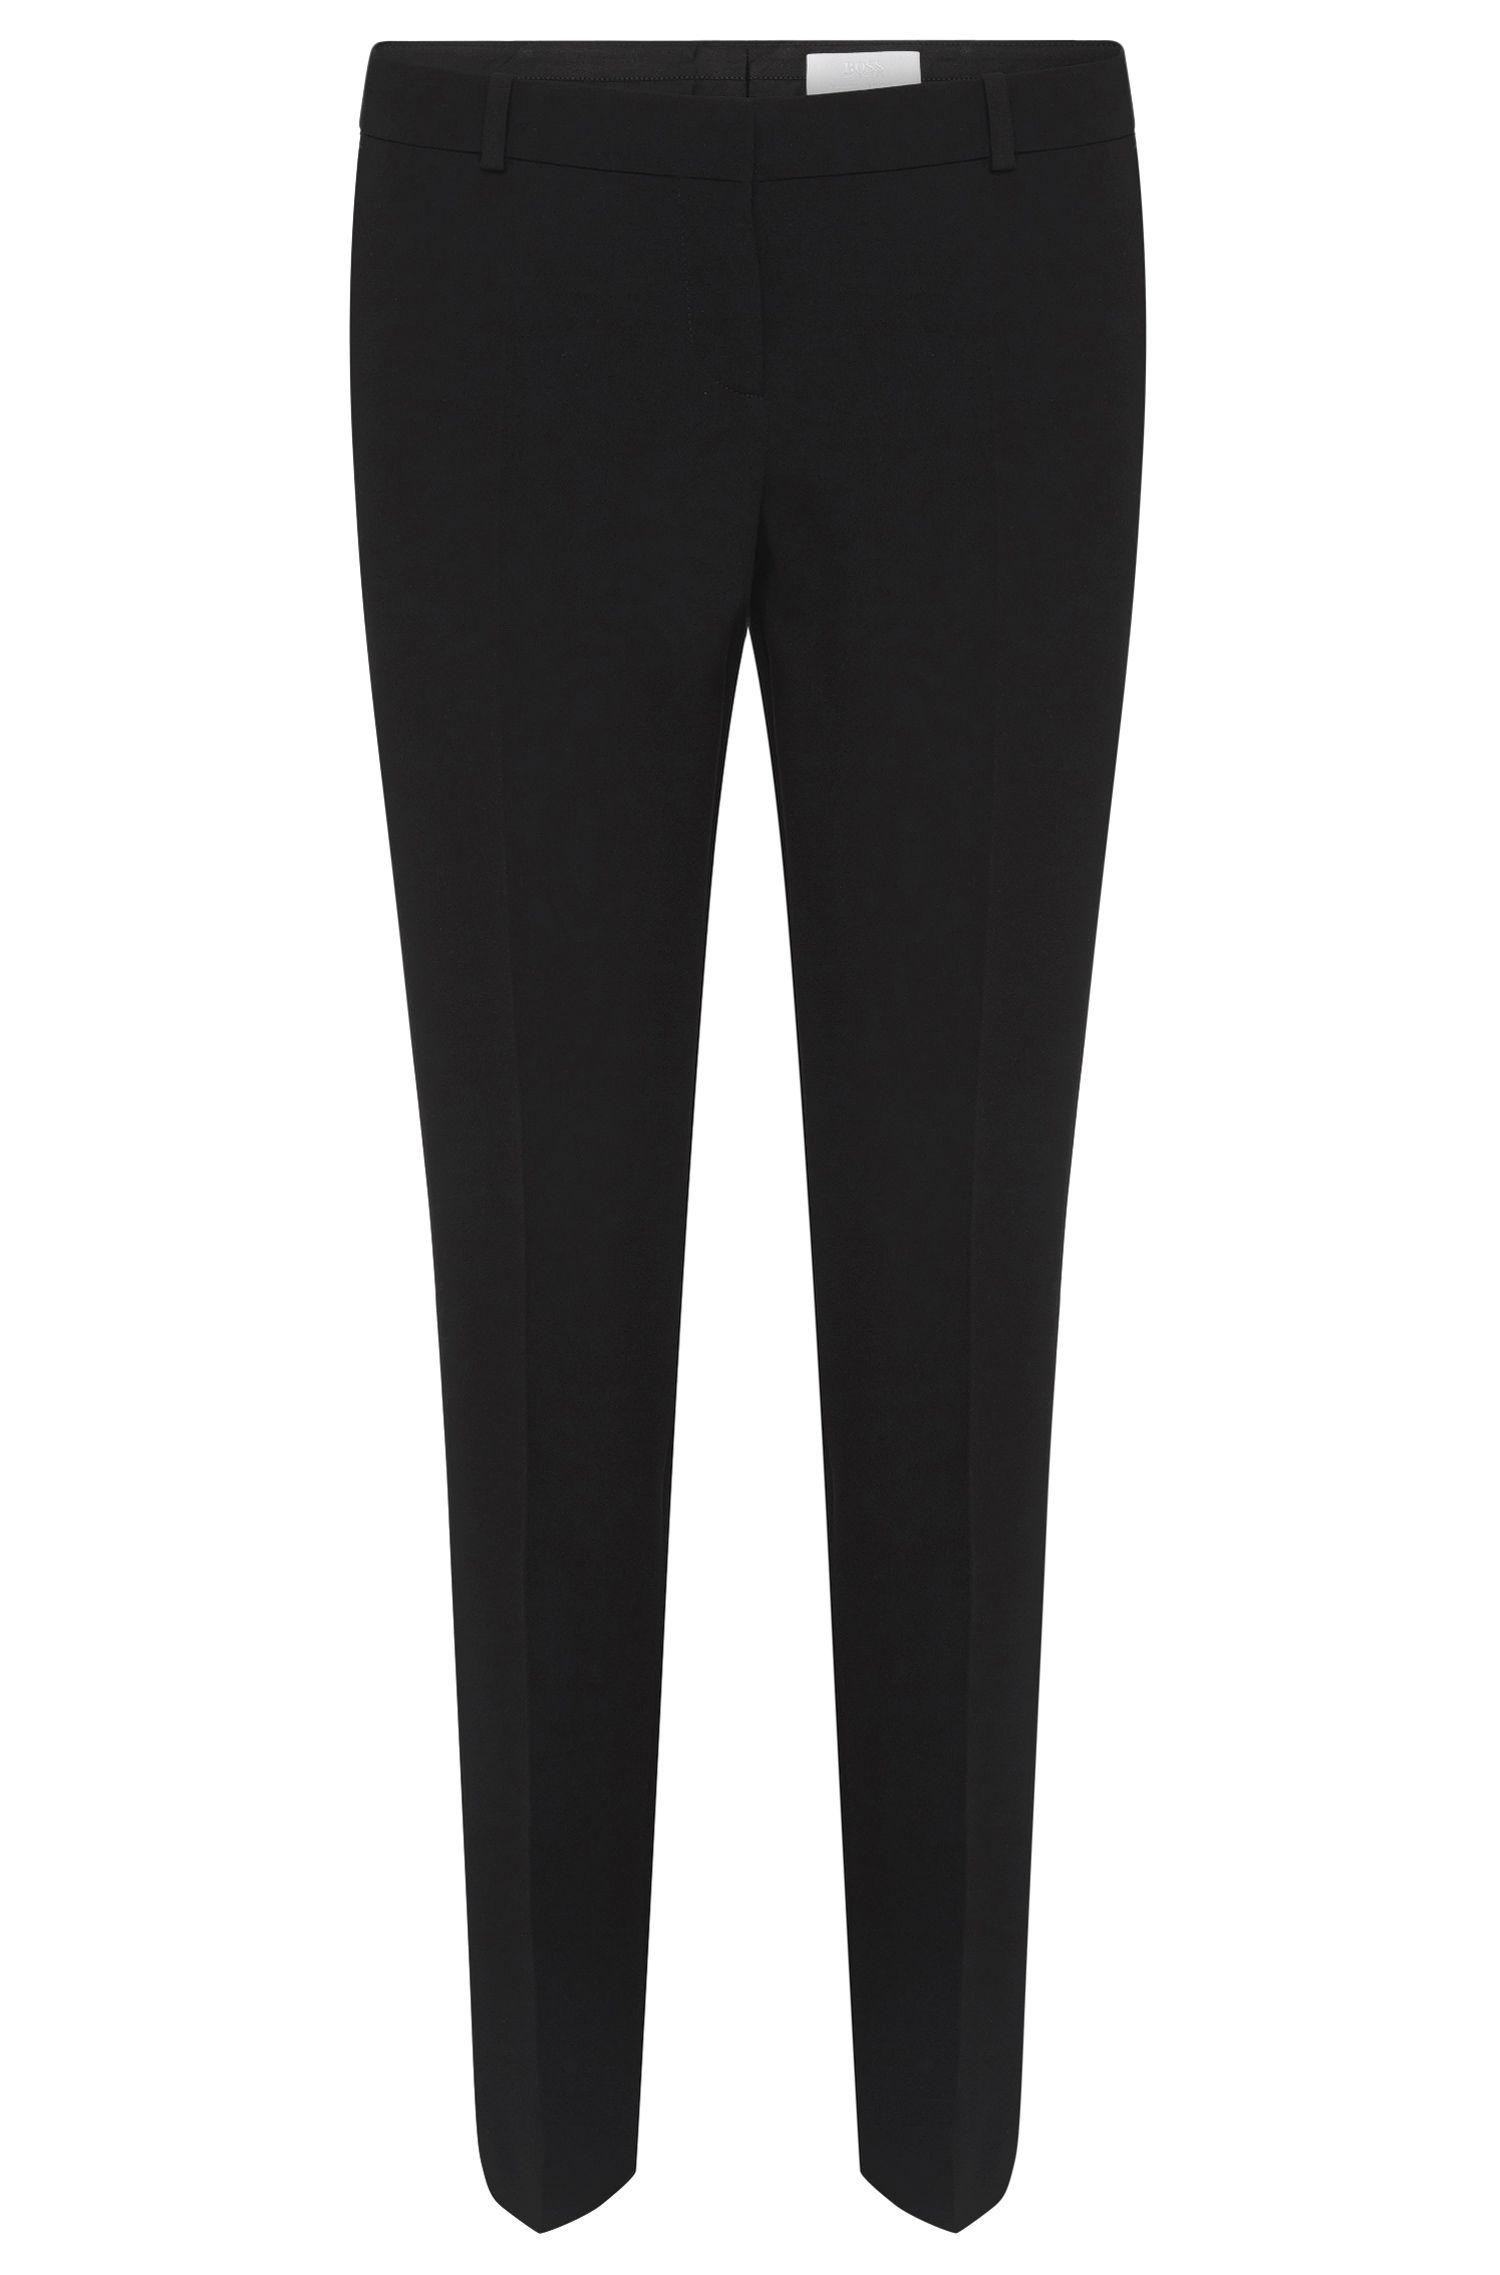 'FS_Tilunina' | Crepe Dress Pants